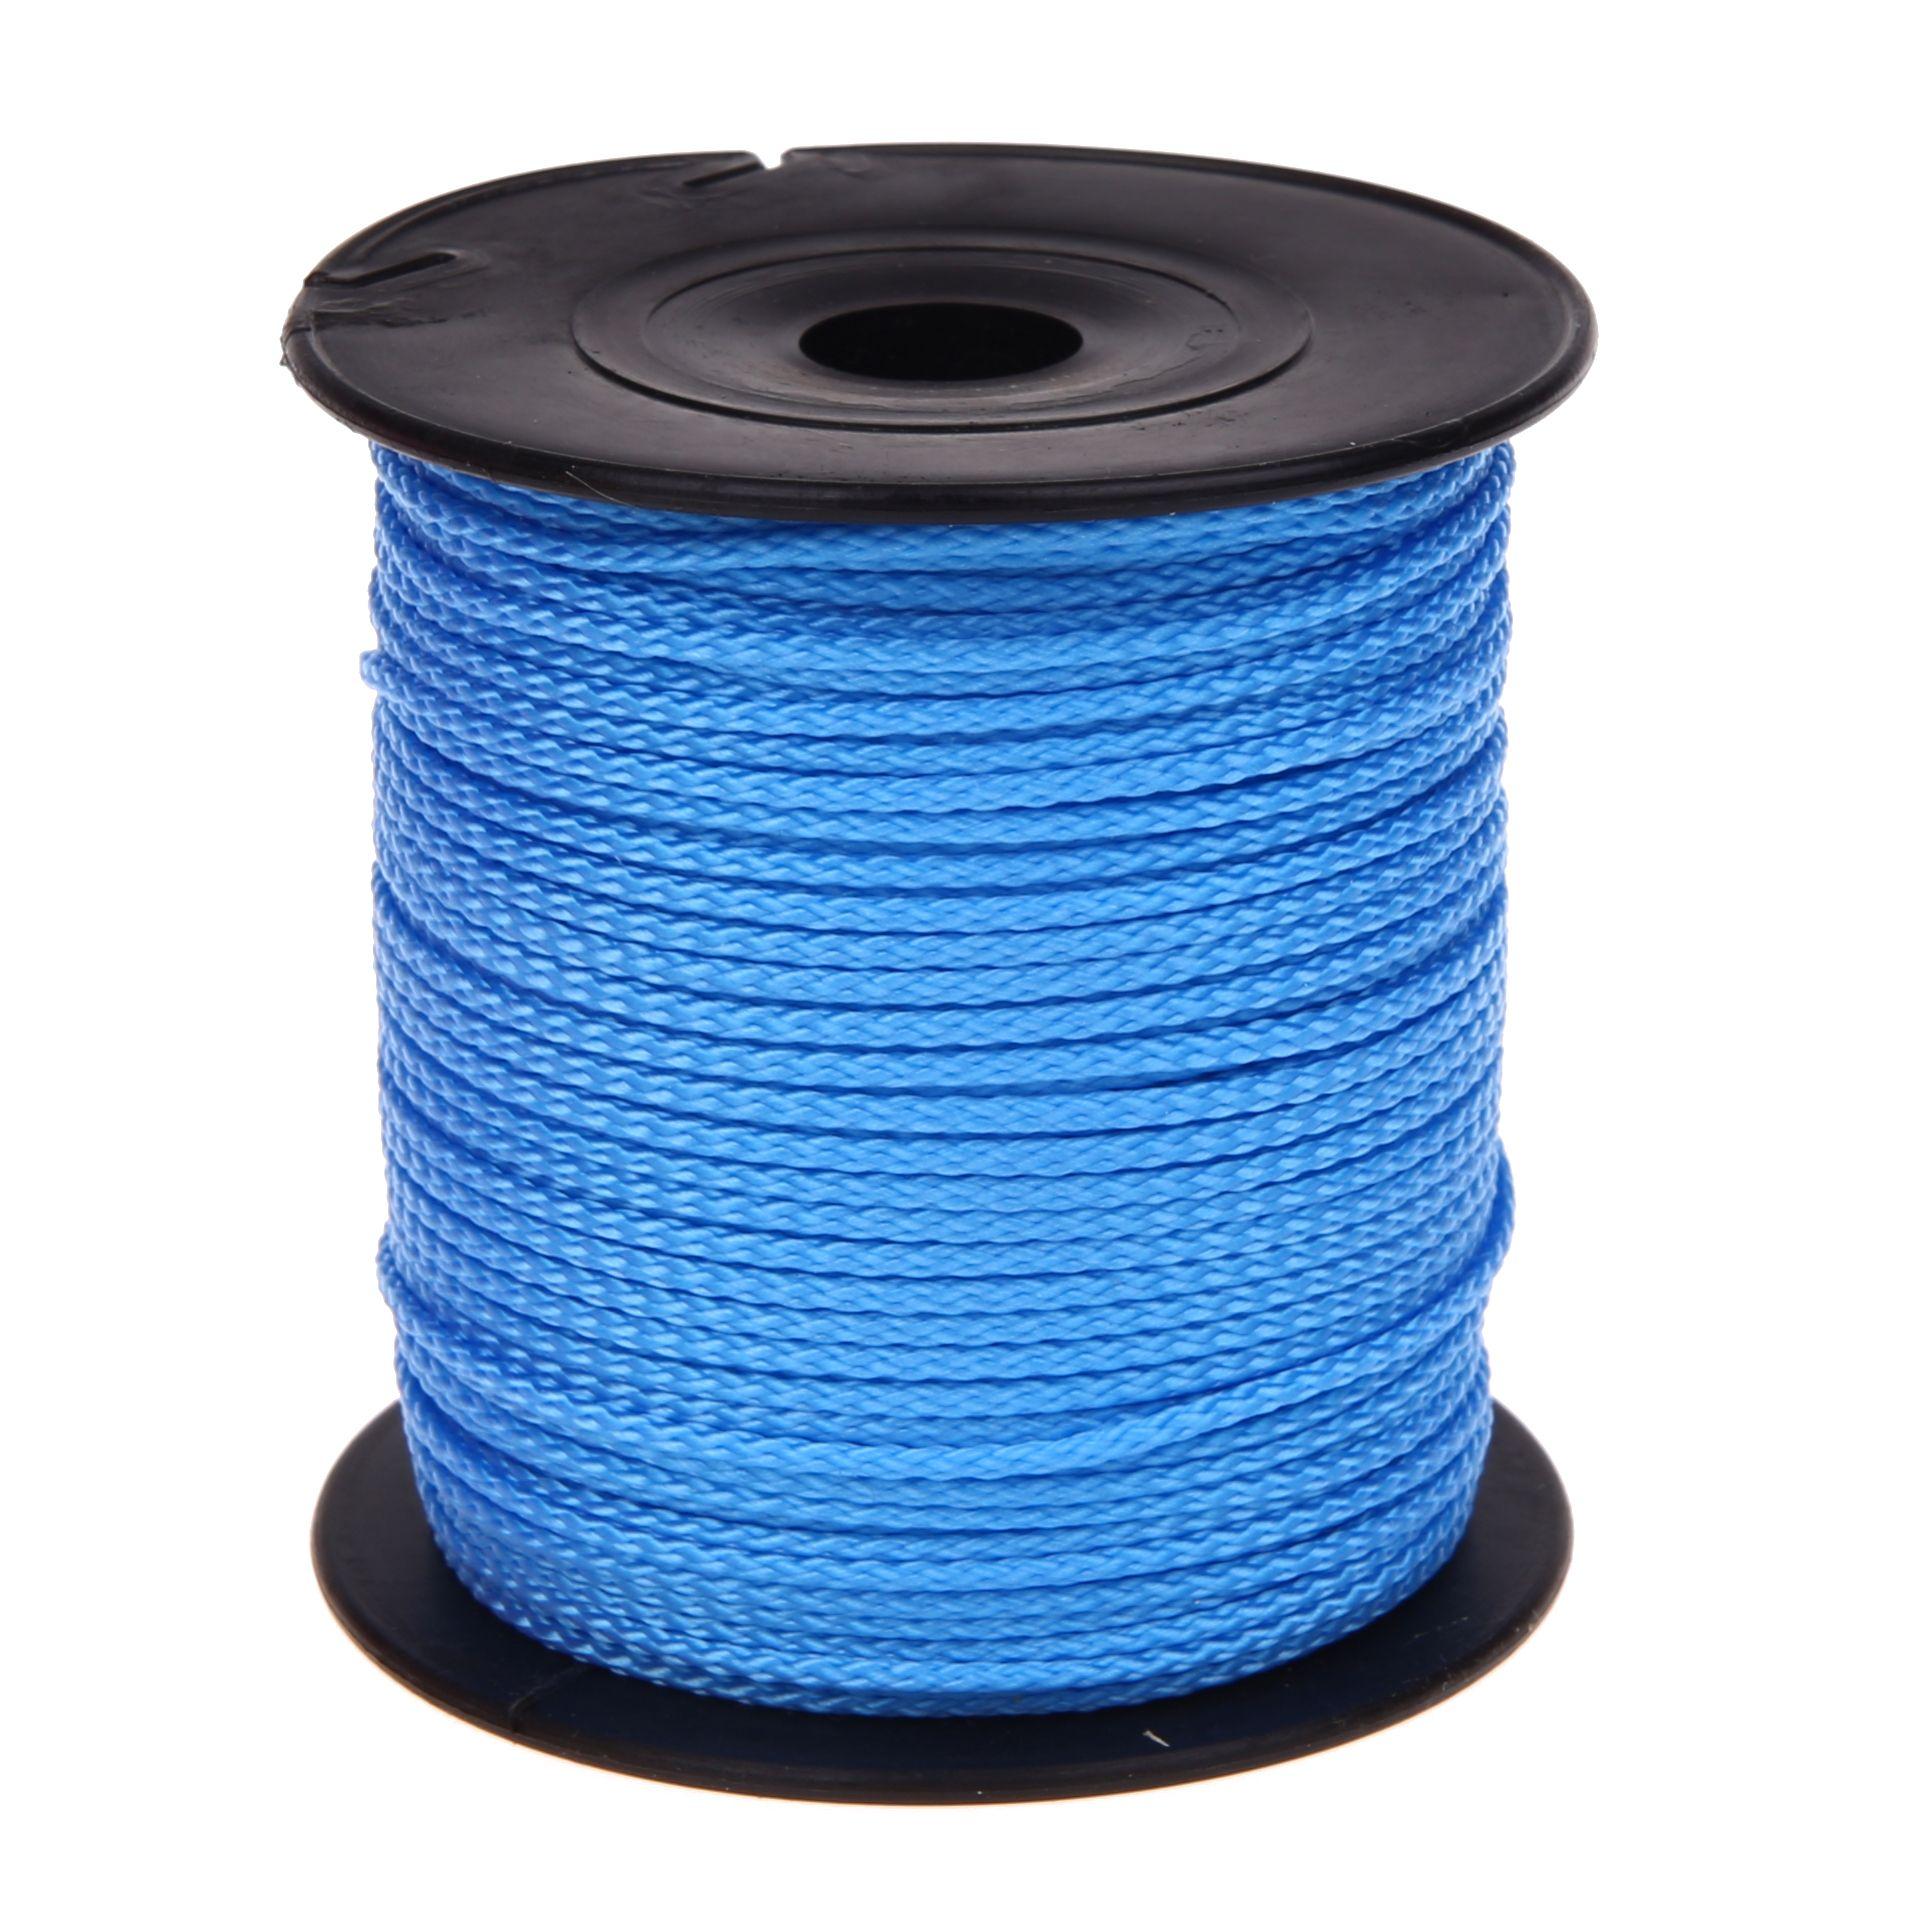 Polyester-Faden Ø 1,5mm • 1 Meter 'skyblau' 170 auf Lager